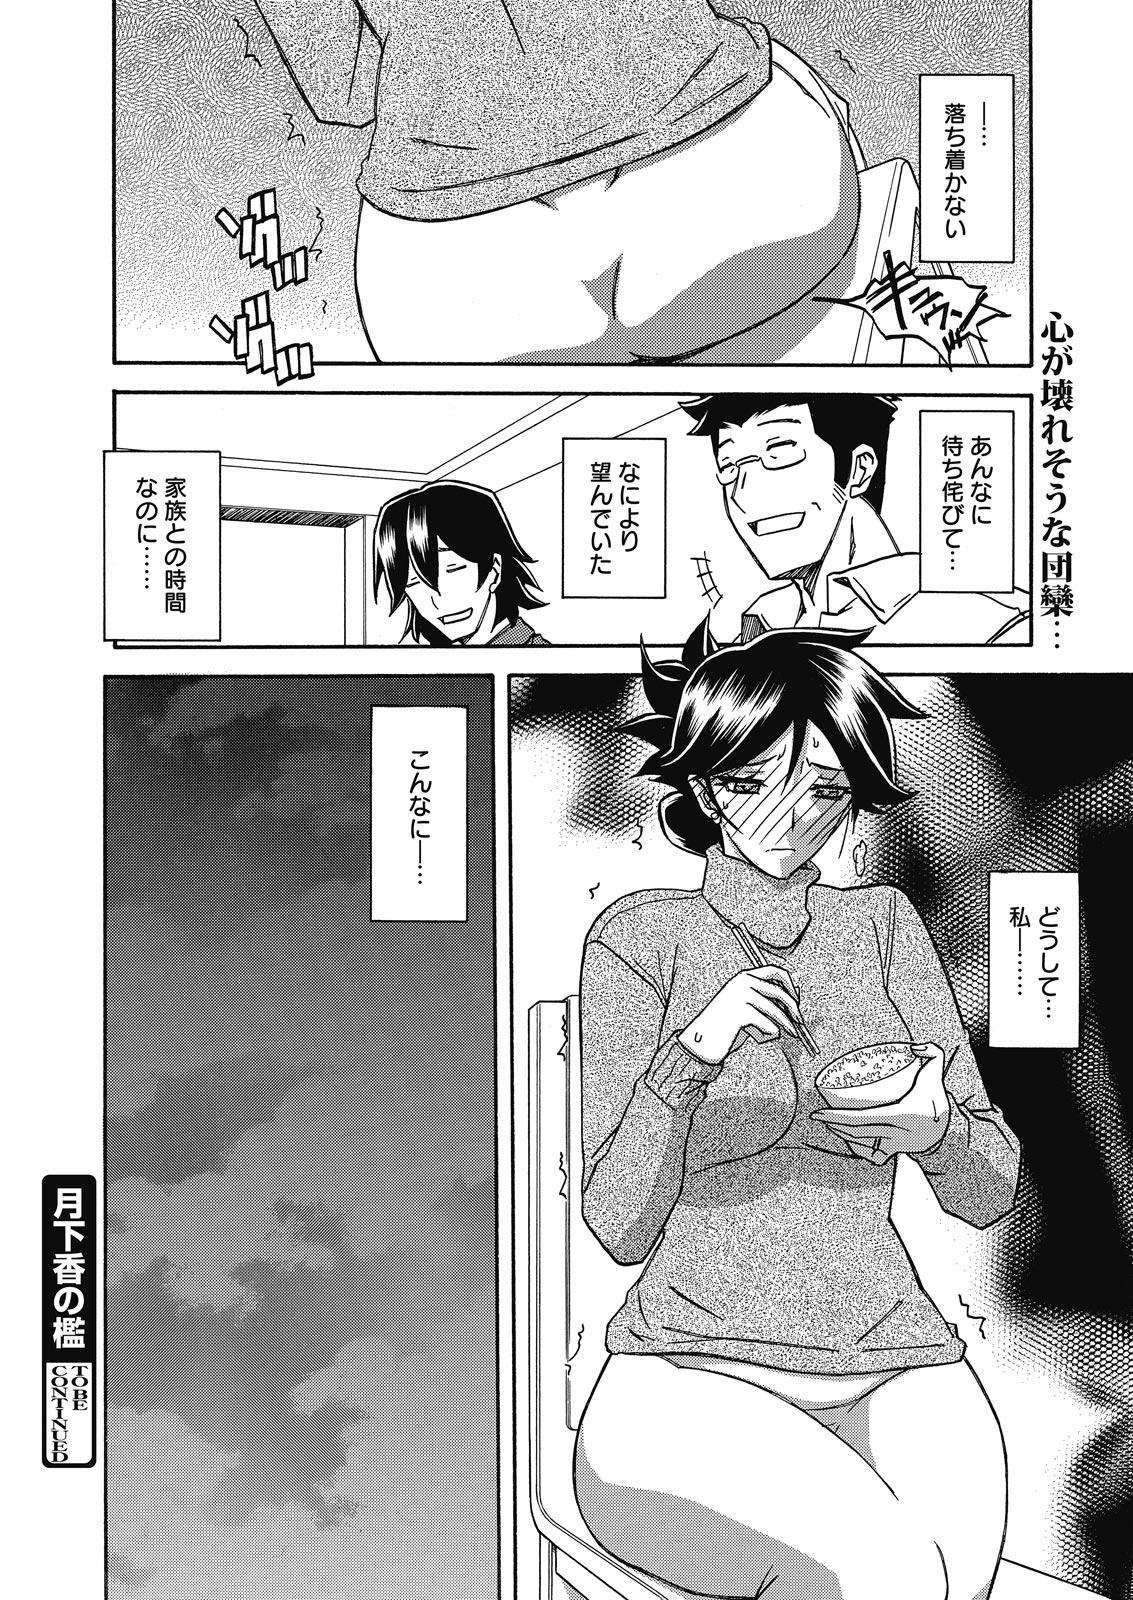 Web Manga Bangaichi Vol. 7 65